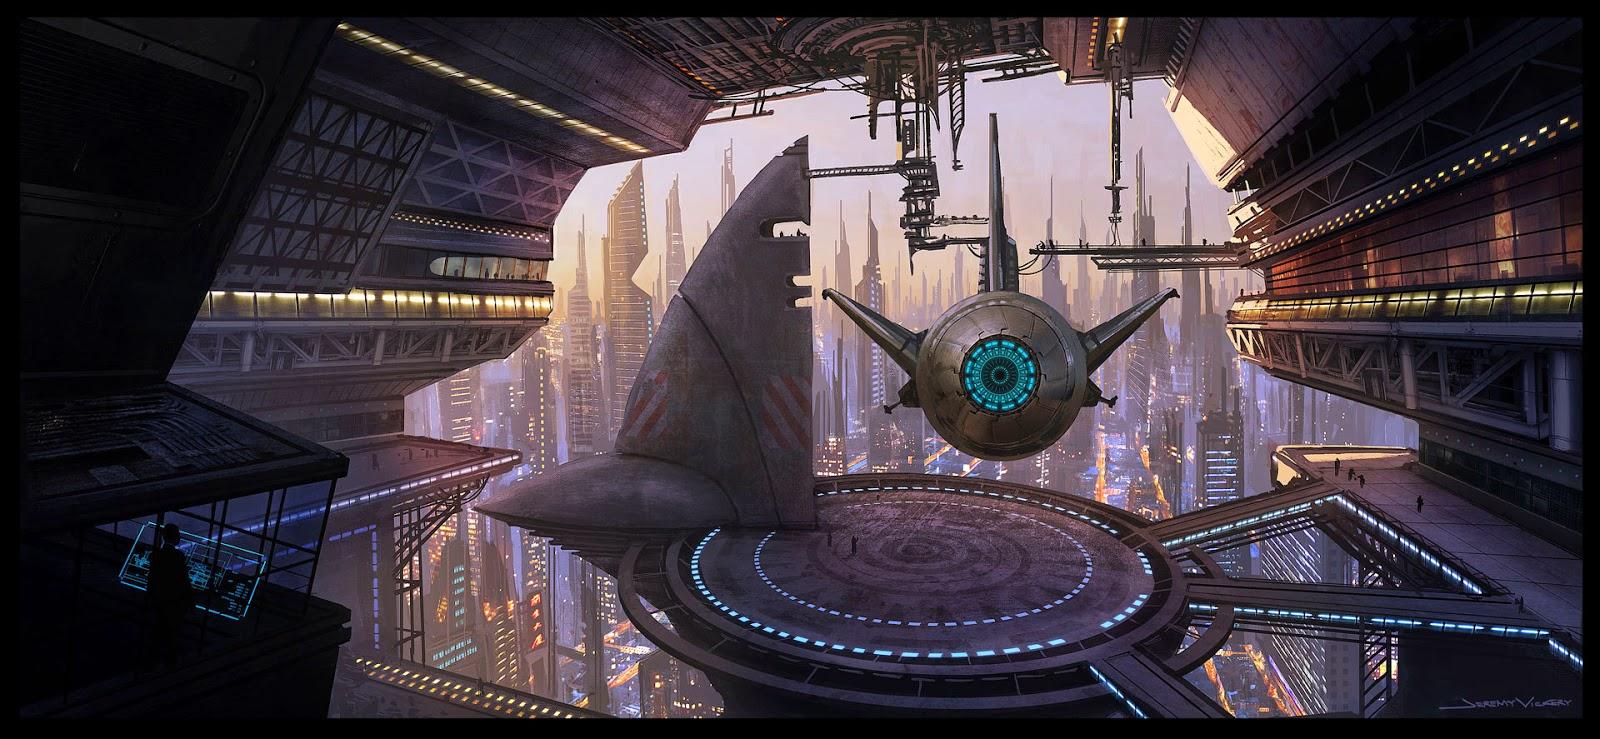 Jeremy Vickery -concept artist: Concept Art